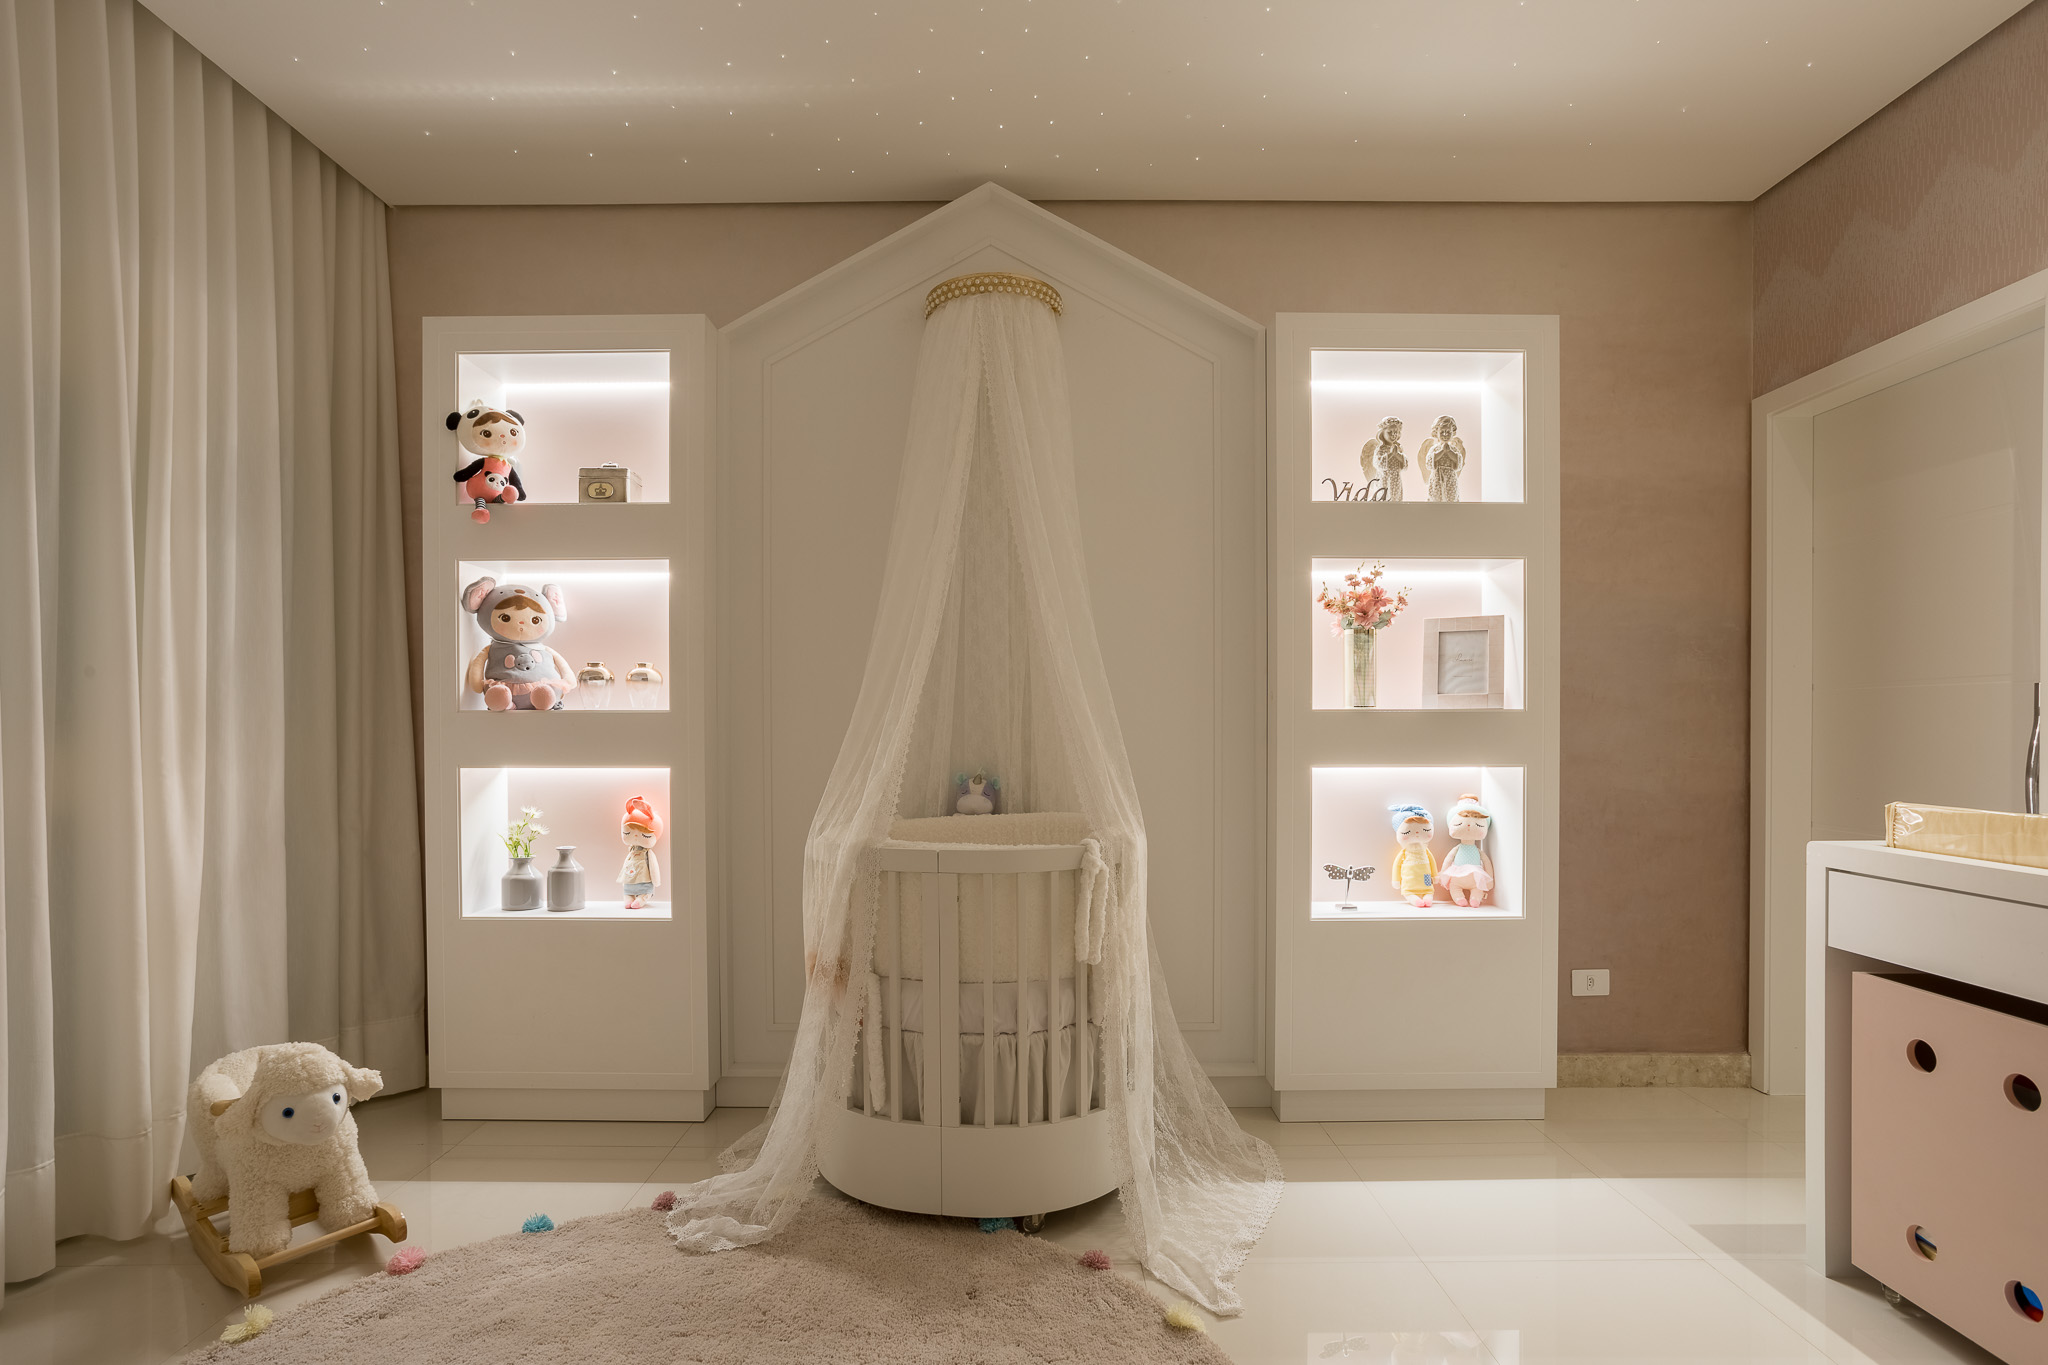 nichos-quarto-infantil-luz-embutida